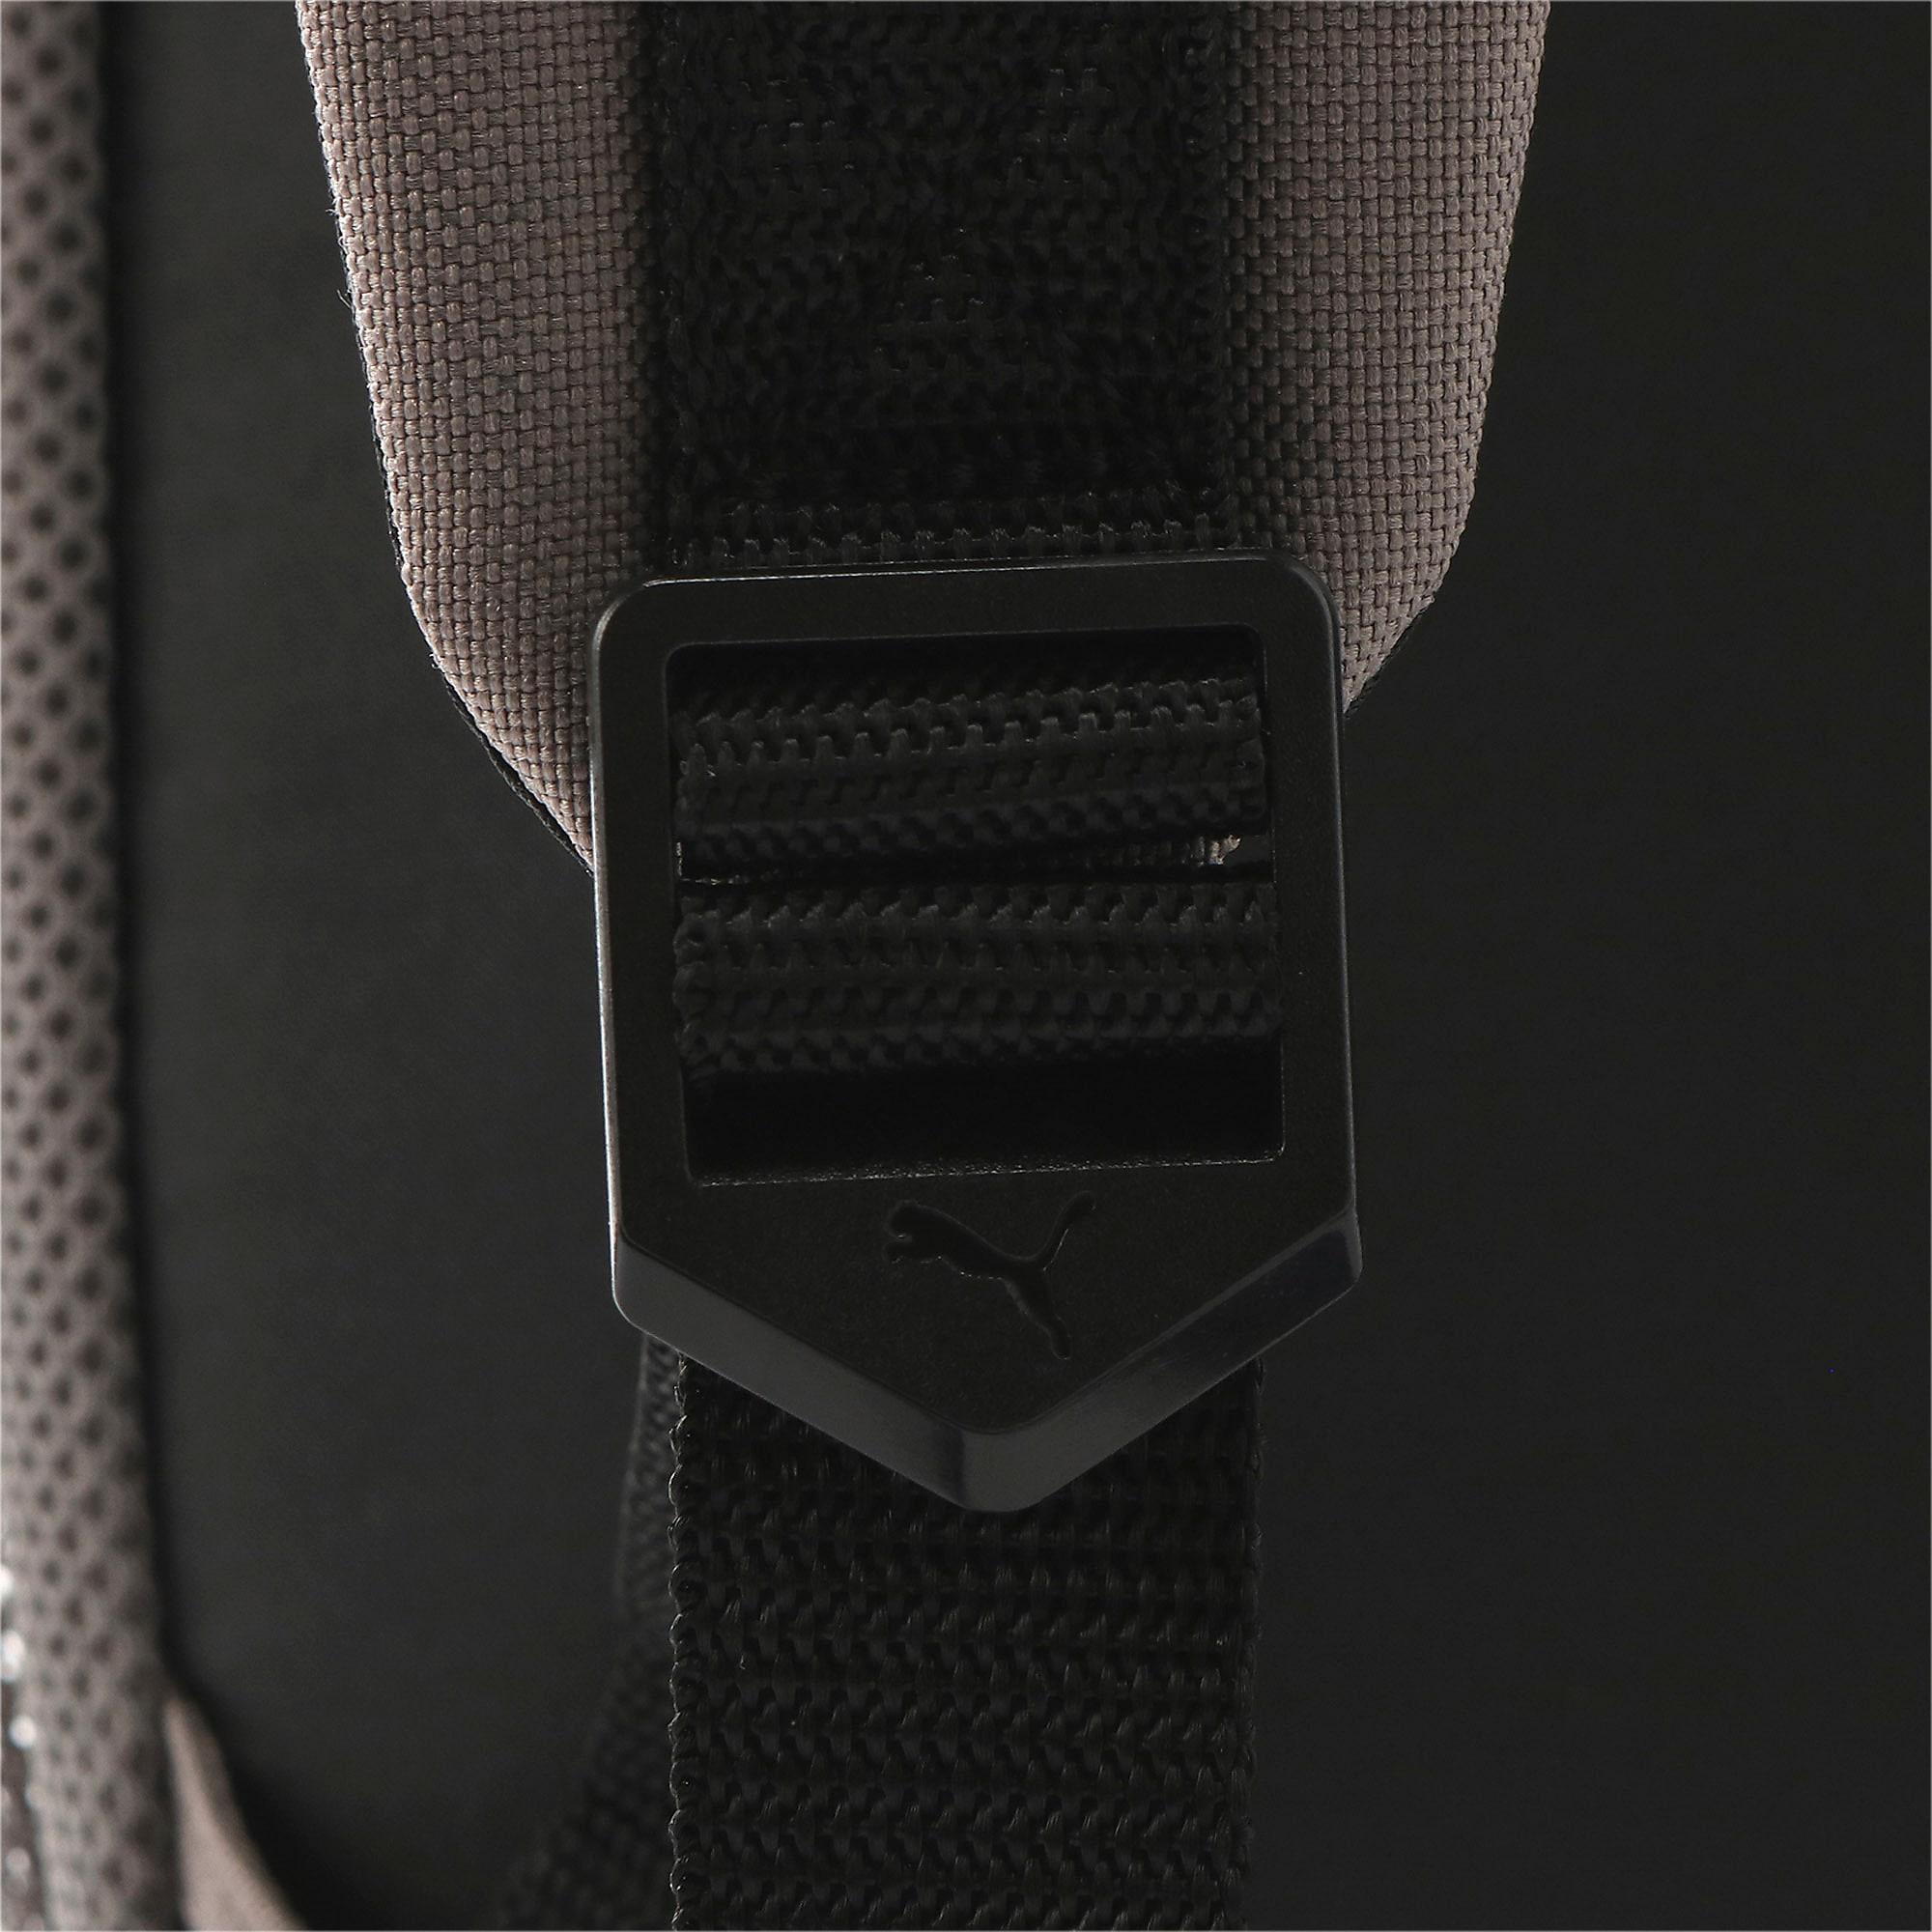 Thumbnail 11 of プーマ プラス バックパック II, Charcoal Gray-Puma Black, medium-JPN